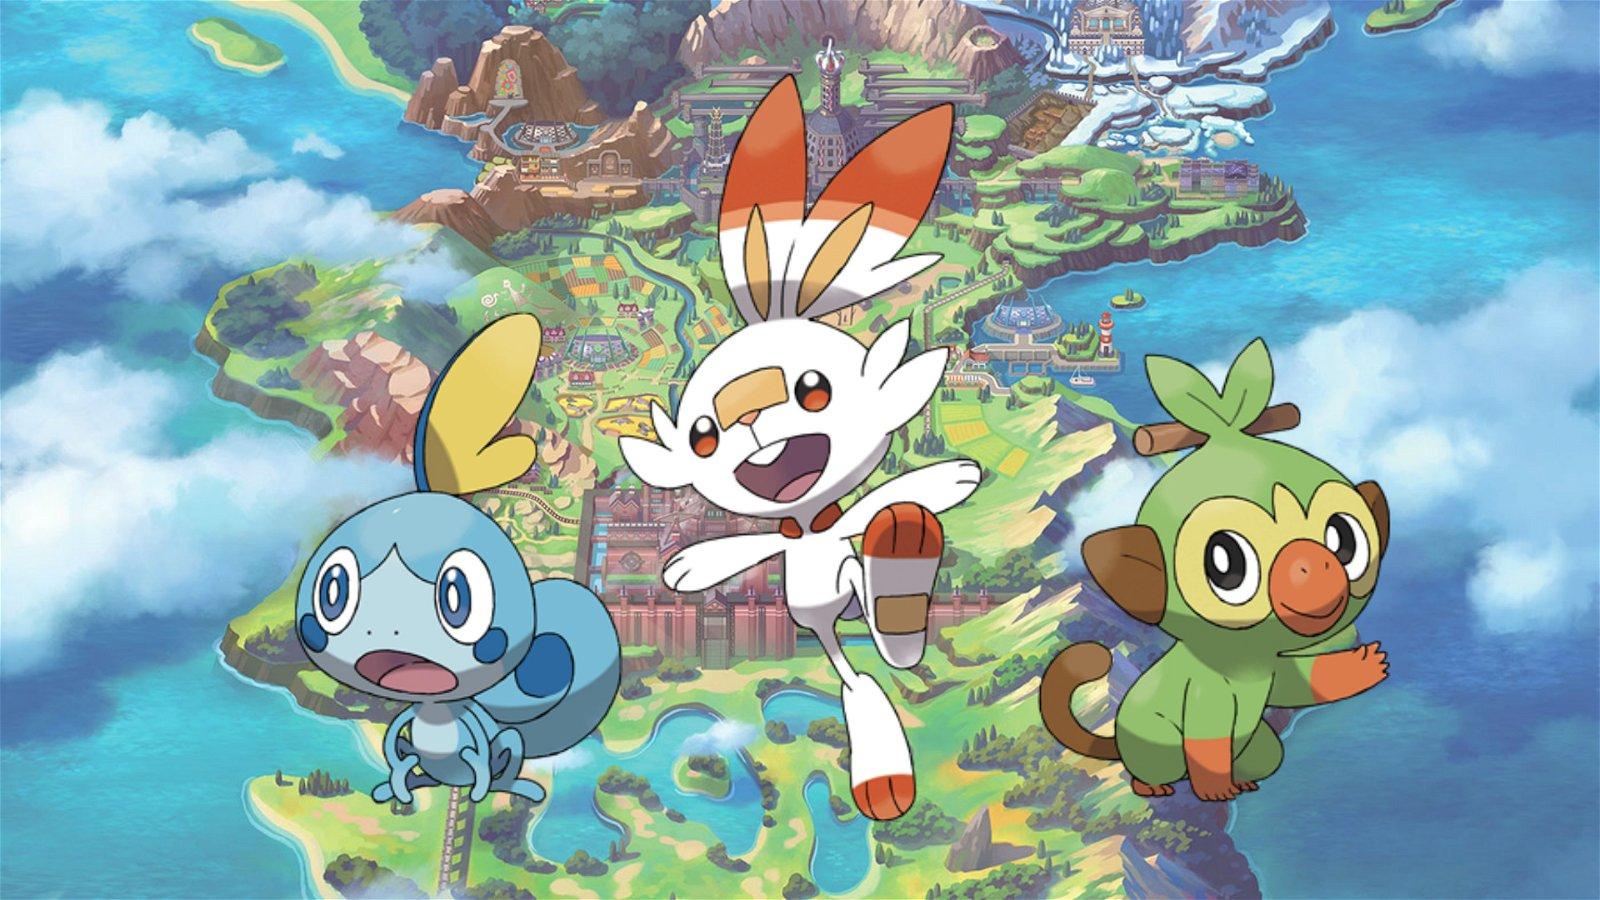 Pokémon Sword and Shield Announced | CGMagazine